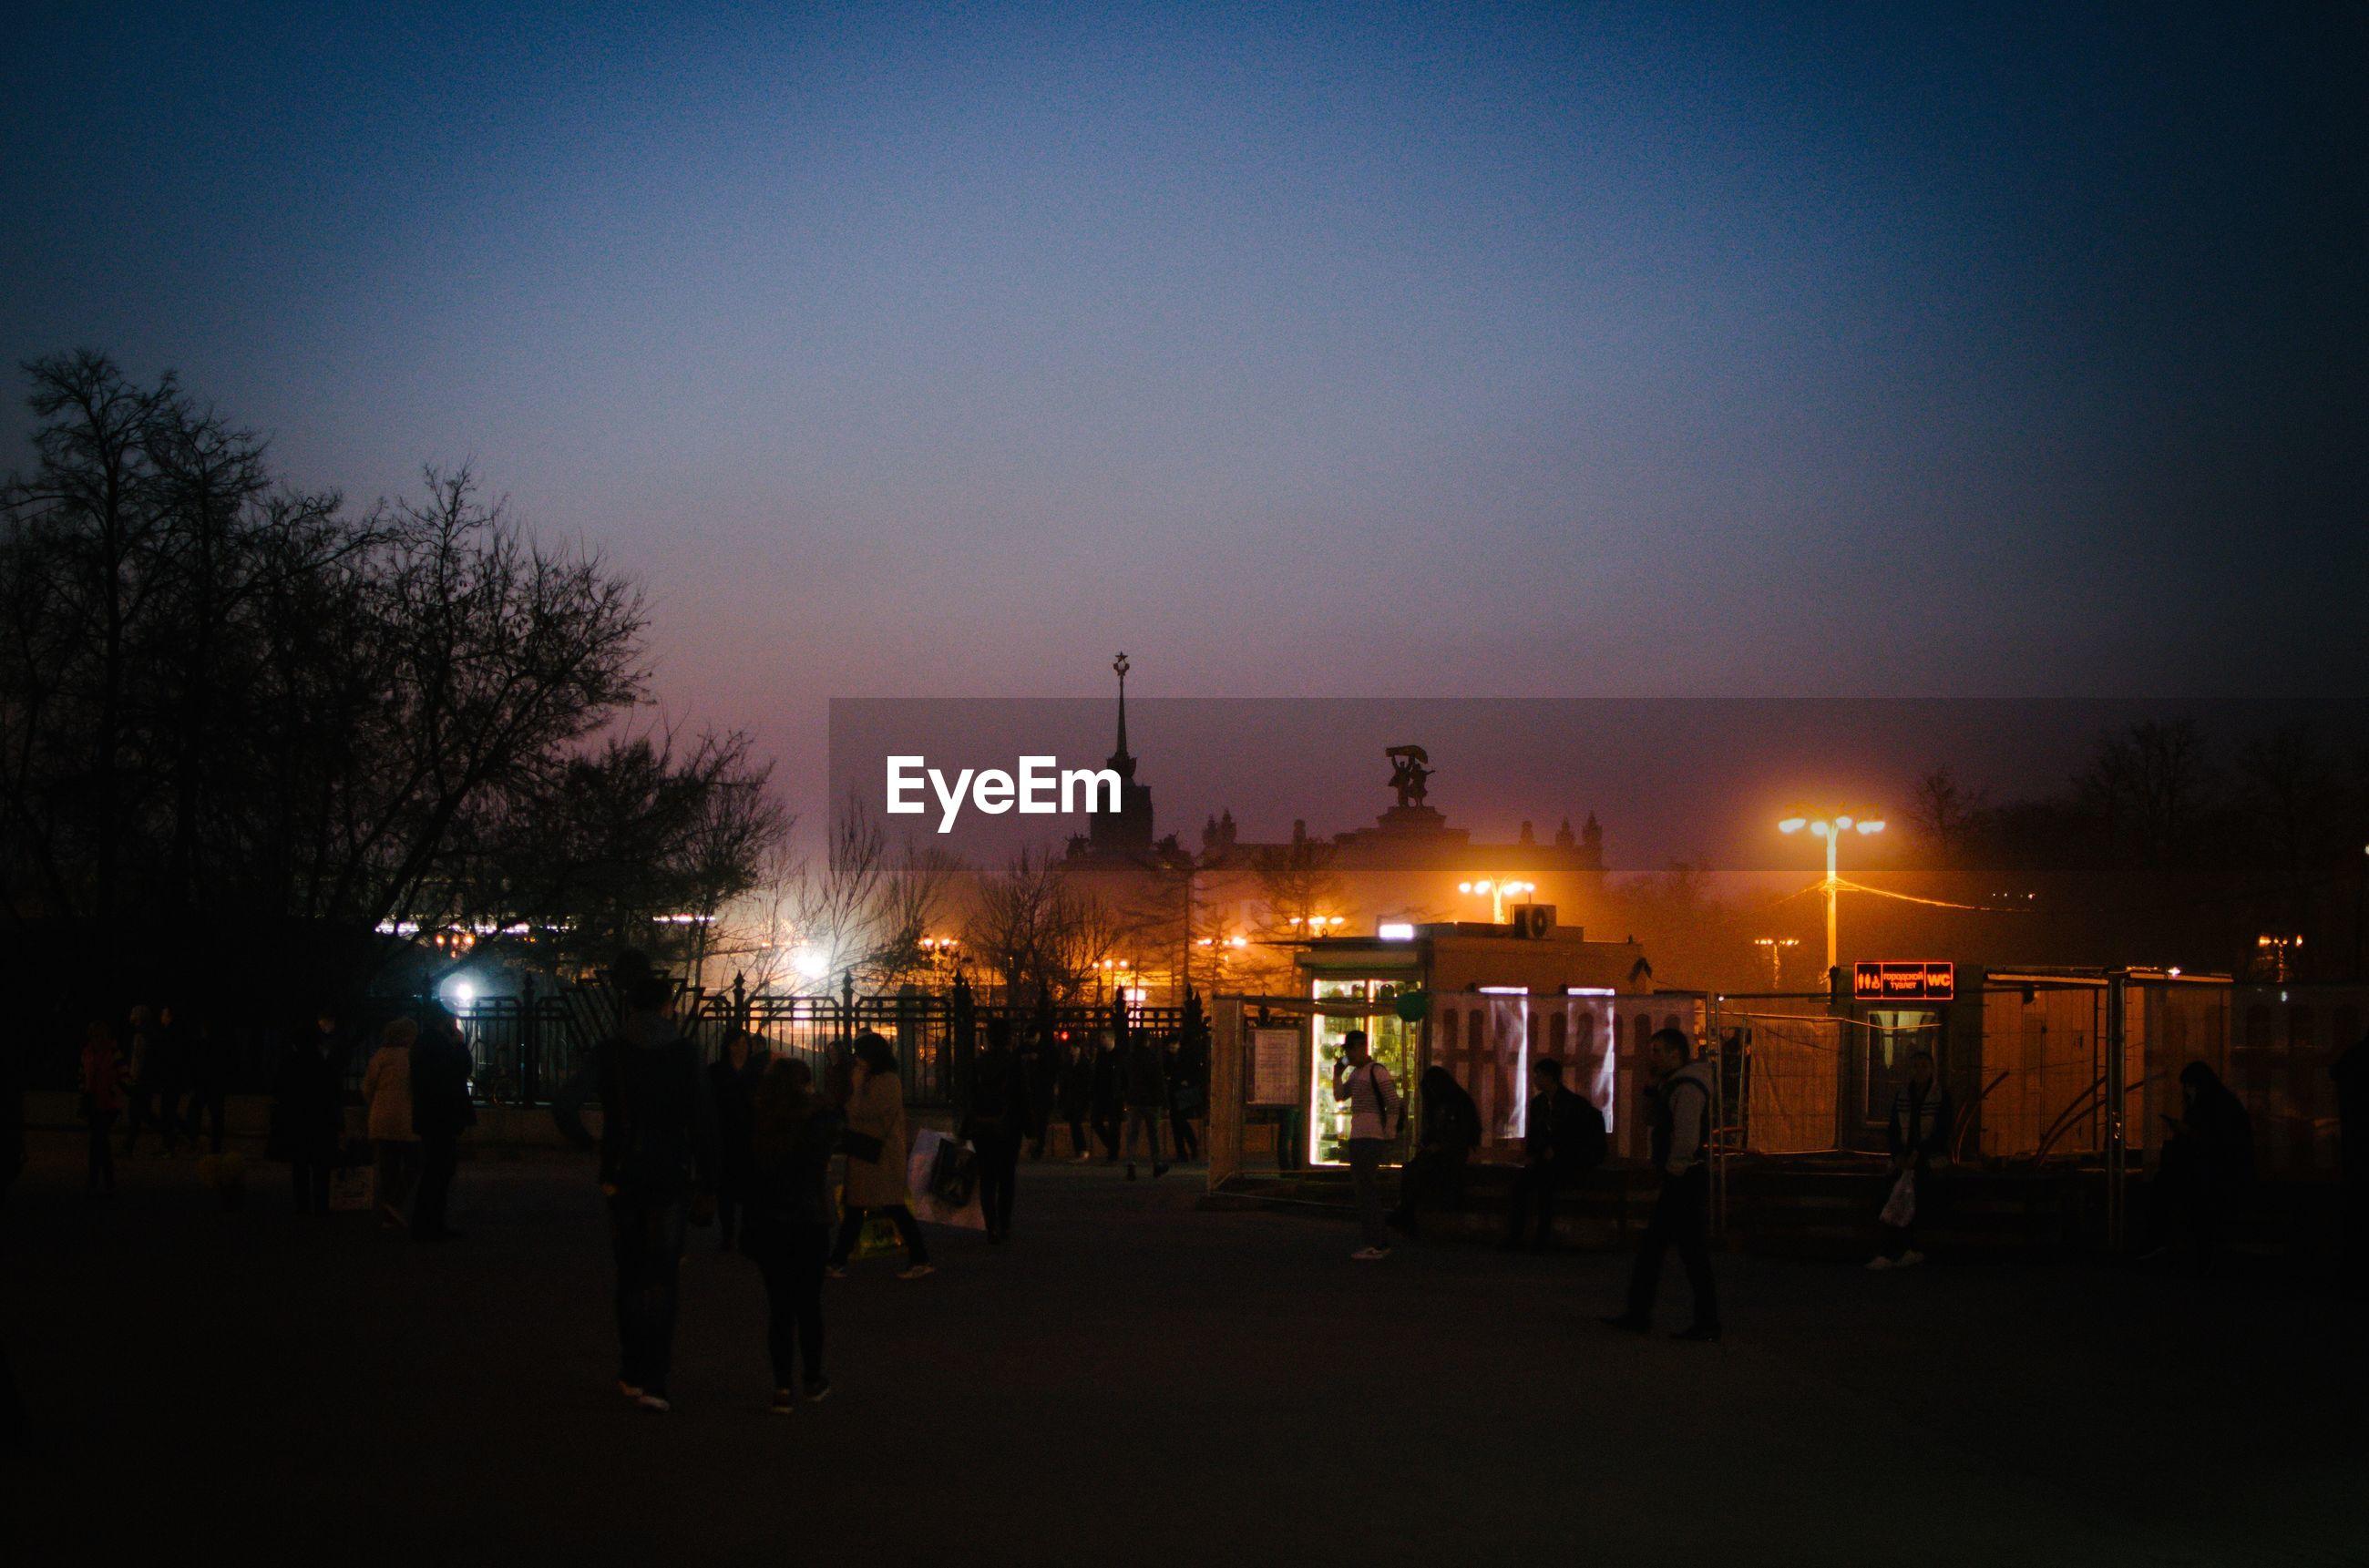 SILHOUETTE OF PEOPLE ON ILLUMINATED STREET AT NIGHT